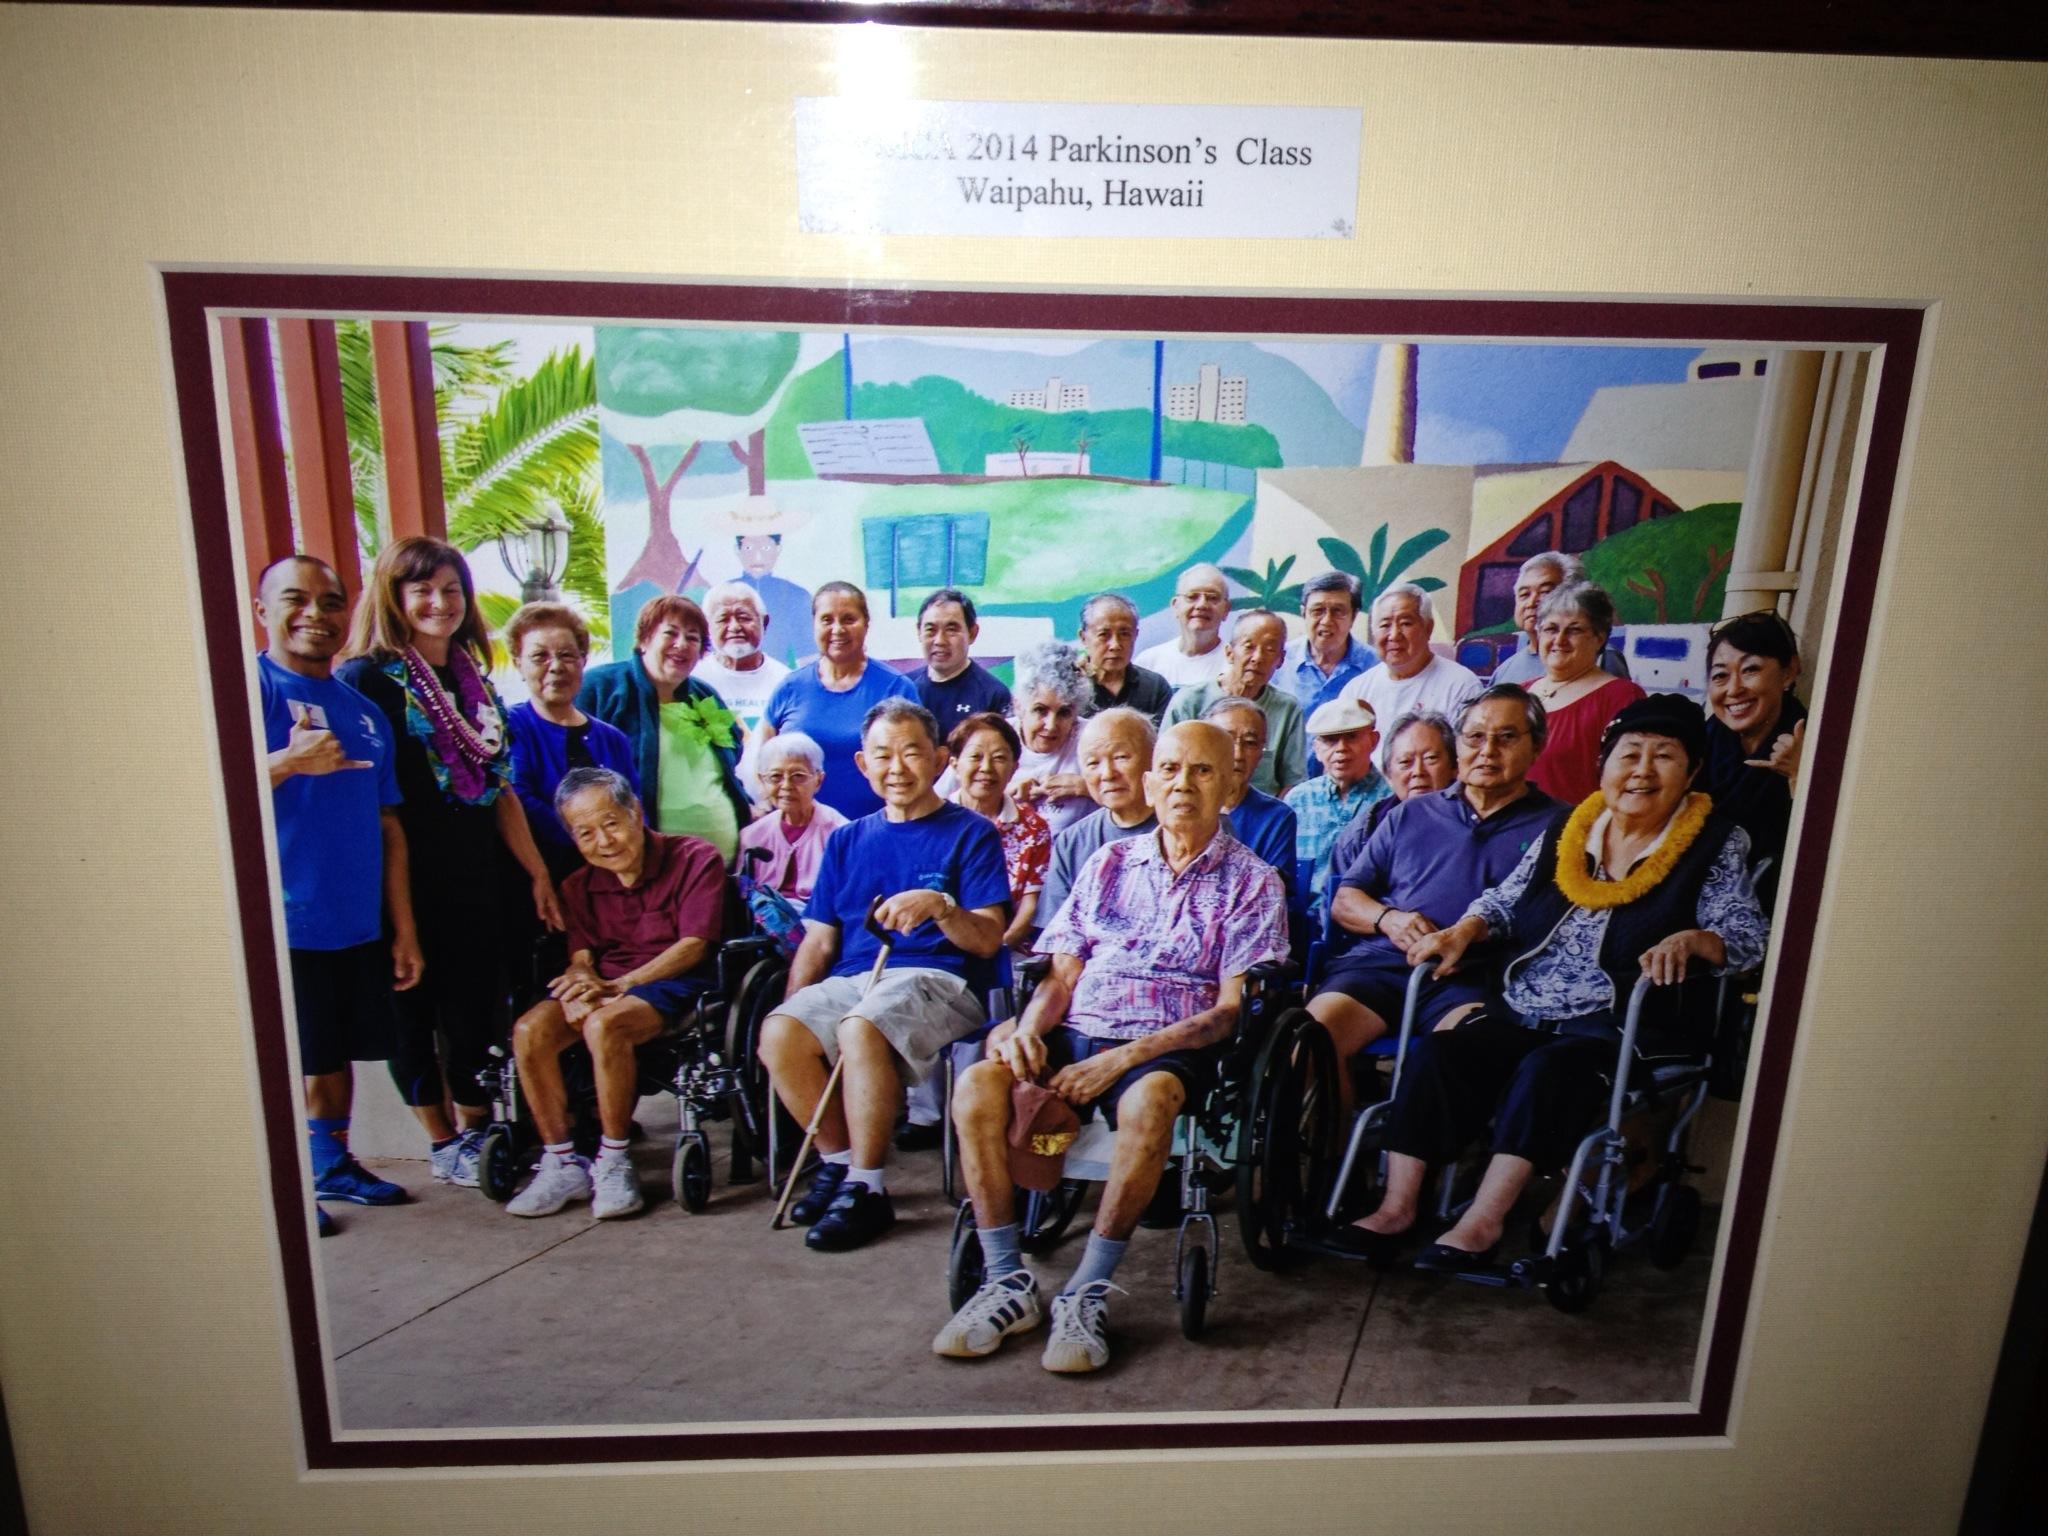 Parkinson's Class Waipahu, Hawaii